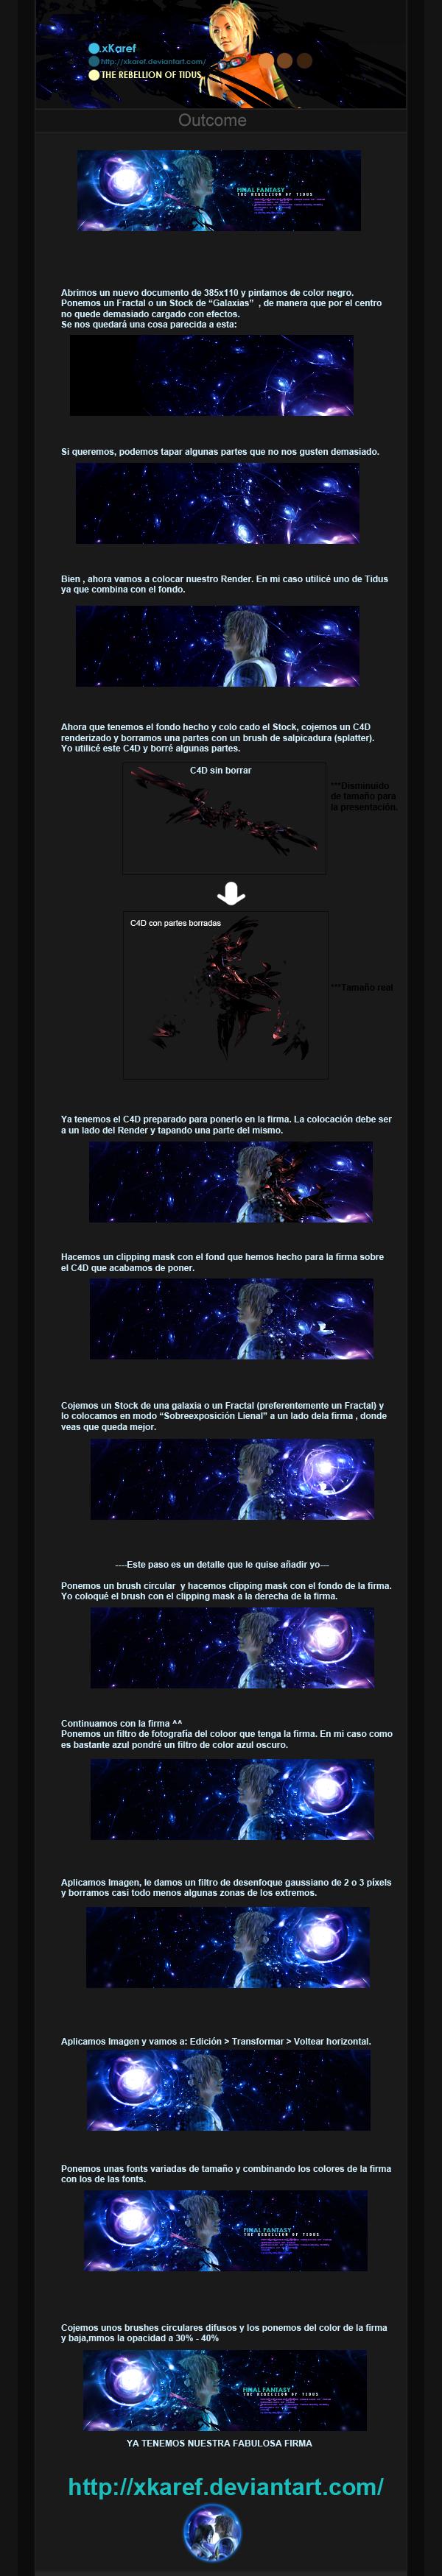 The Rebellion Of Tidus by .xKaref Tutorial_TIDUS_by_xKaref